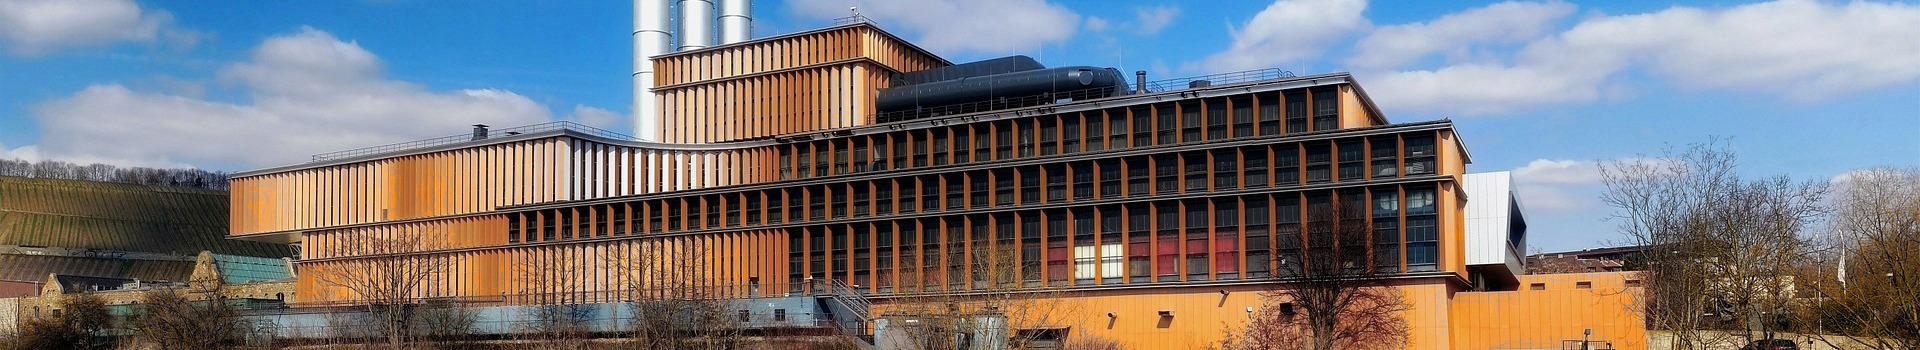 Structure-industrielle